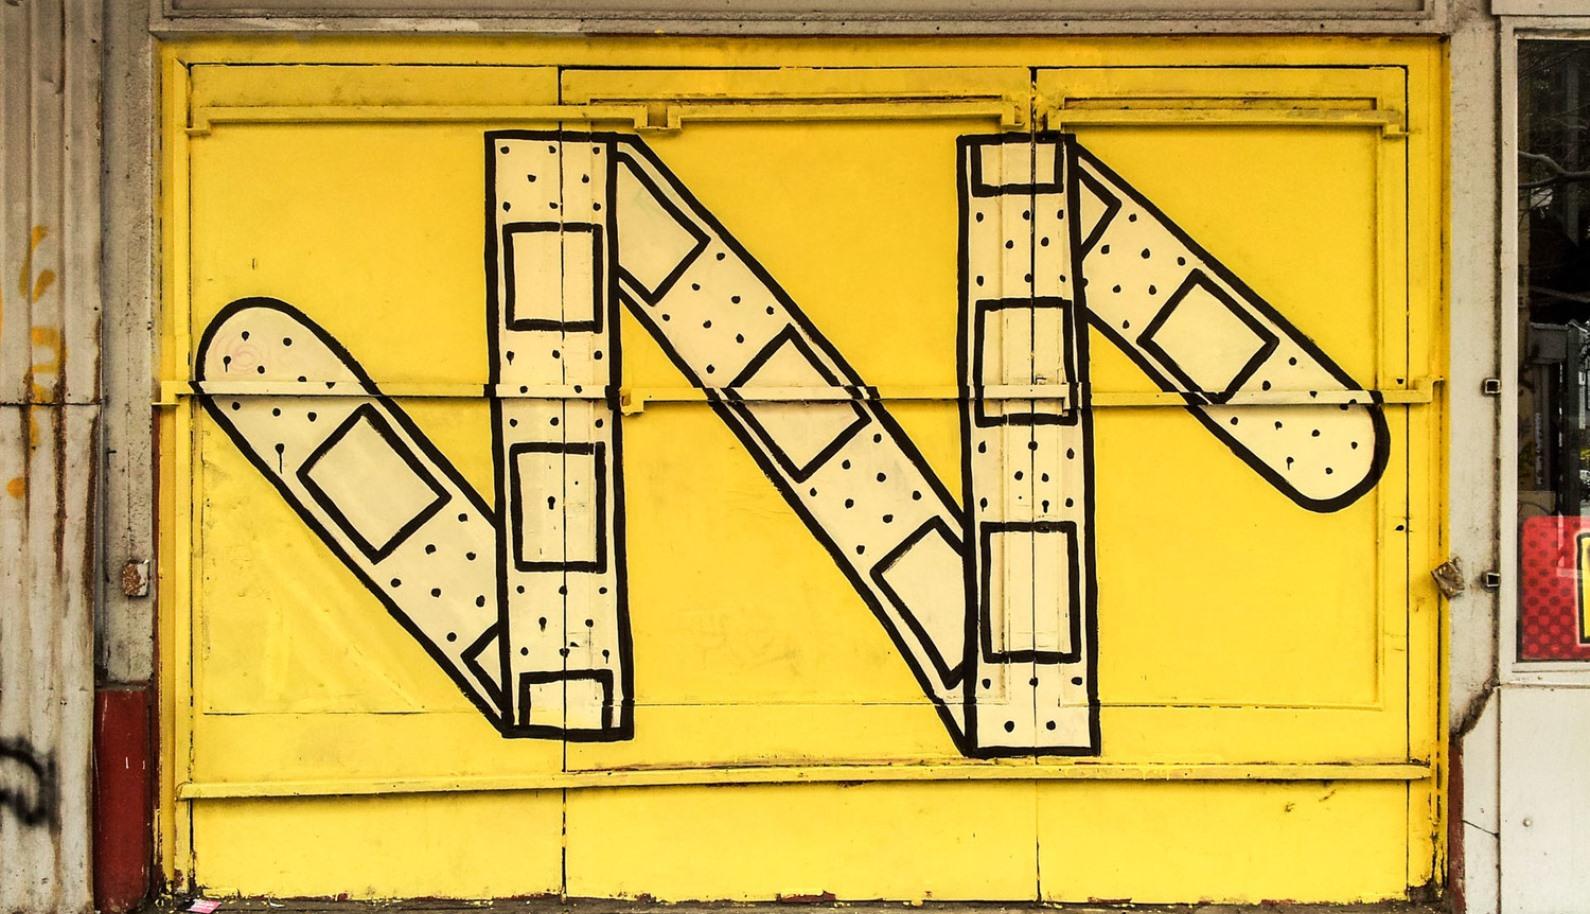 Band-aids, a telltale sign that Tel Aviv street artist Dede was here. Photo courtesy Israel21c